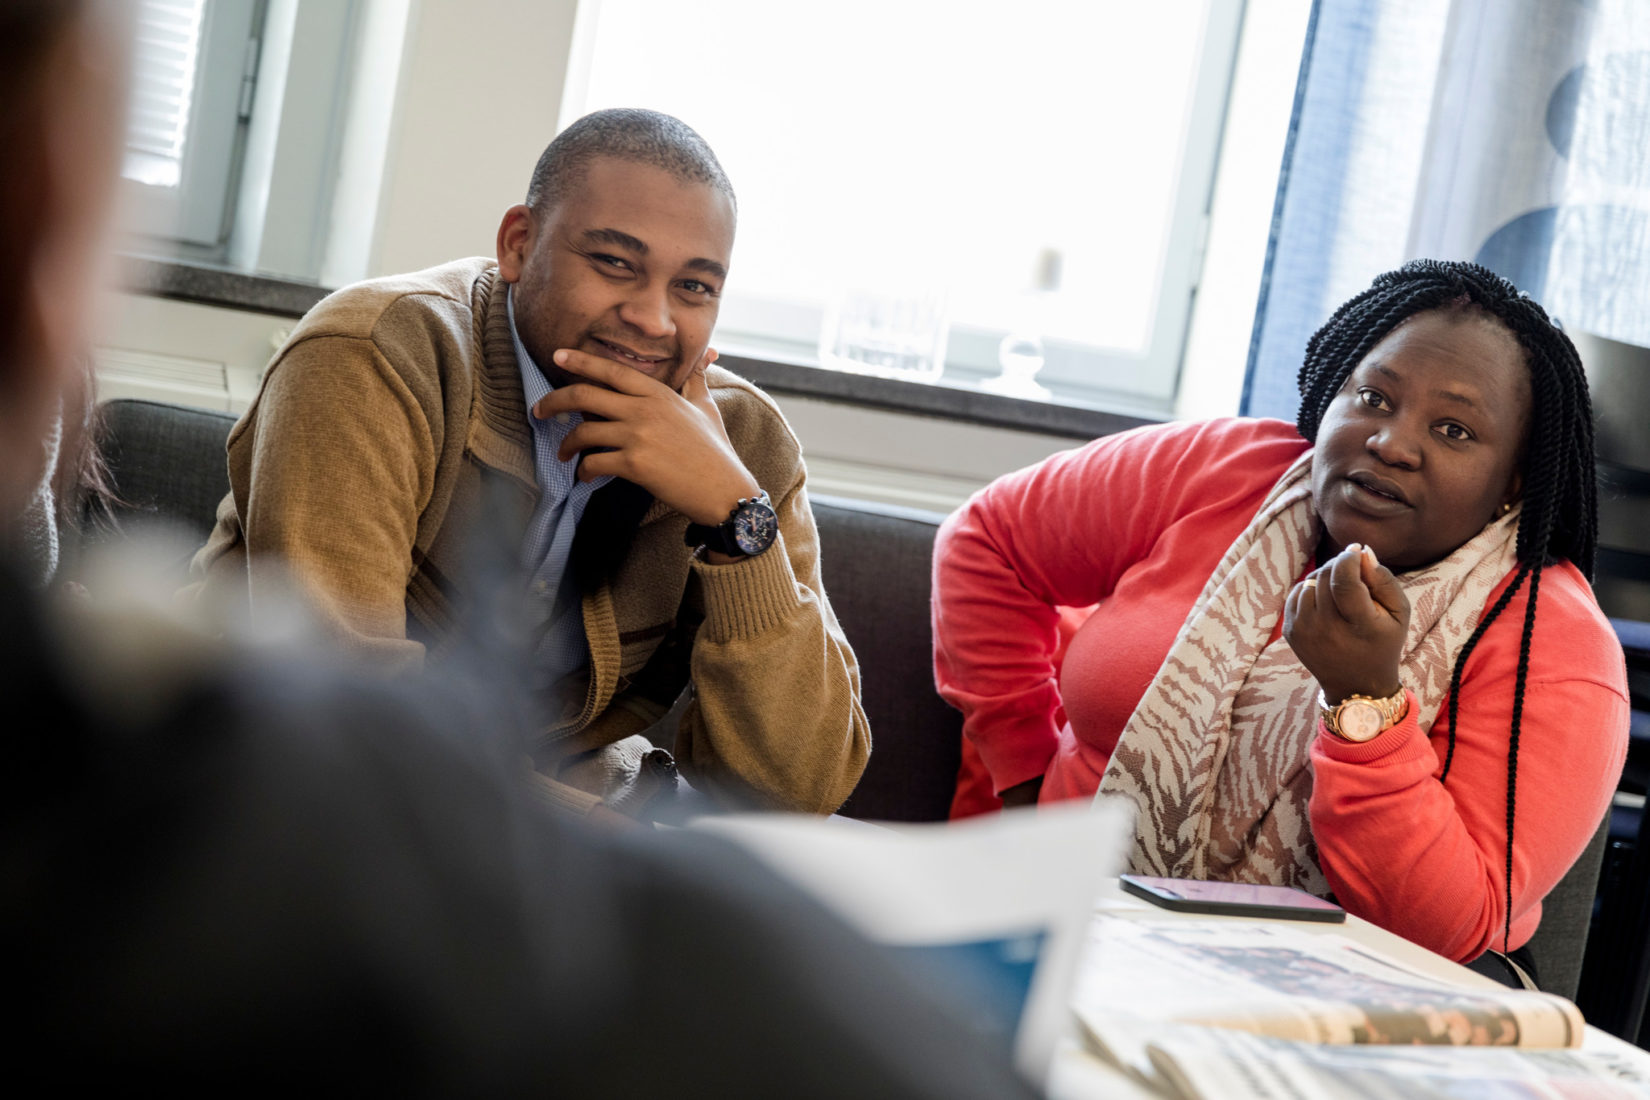 Swedish Institute Management Program Africa 2019 for Change-makers (Moneyed Journey to Sweden)